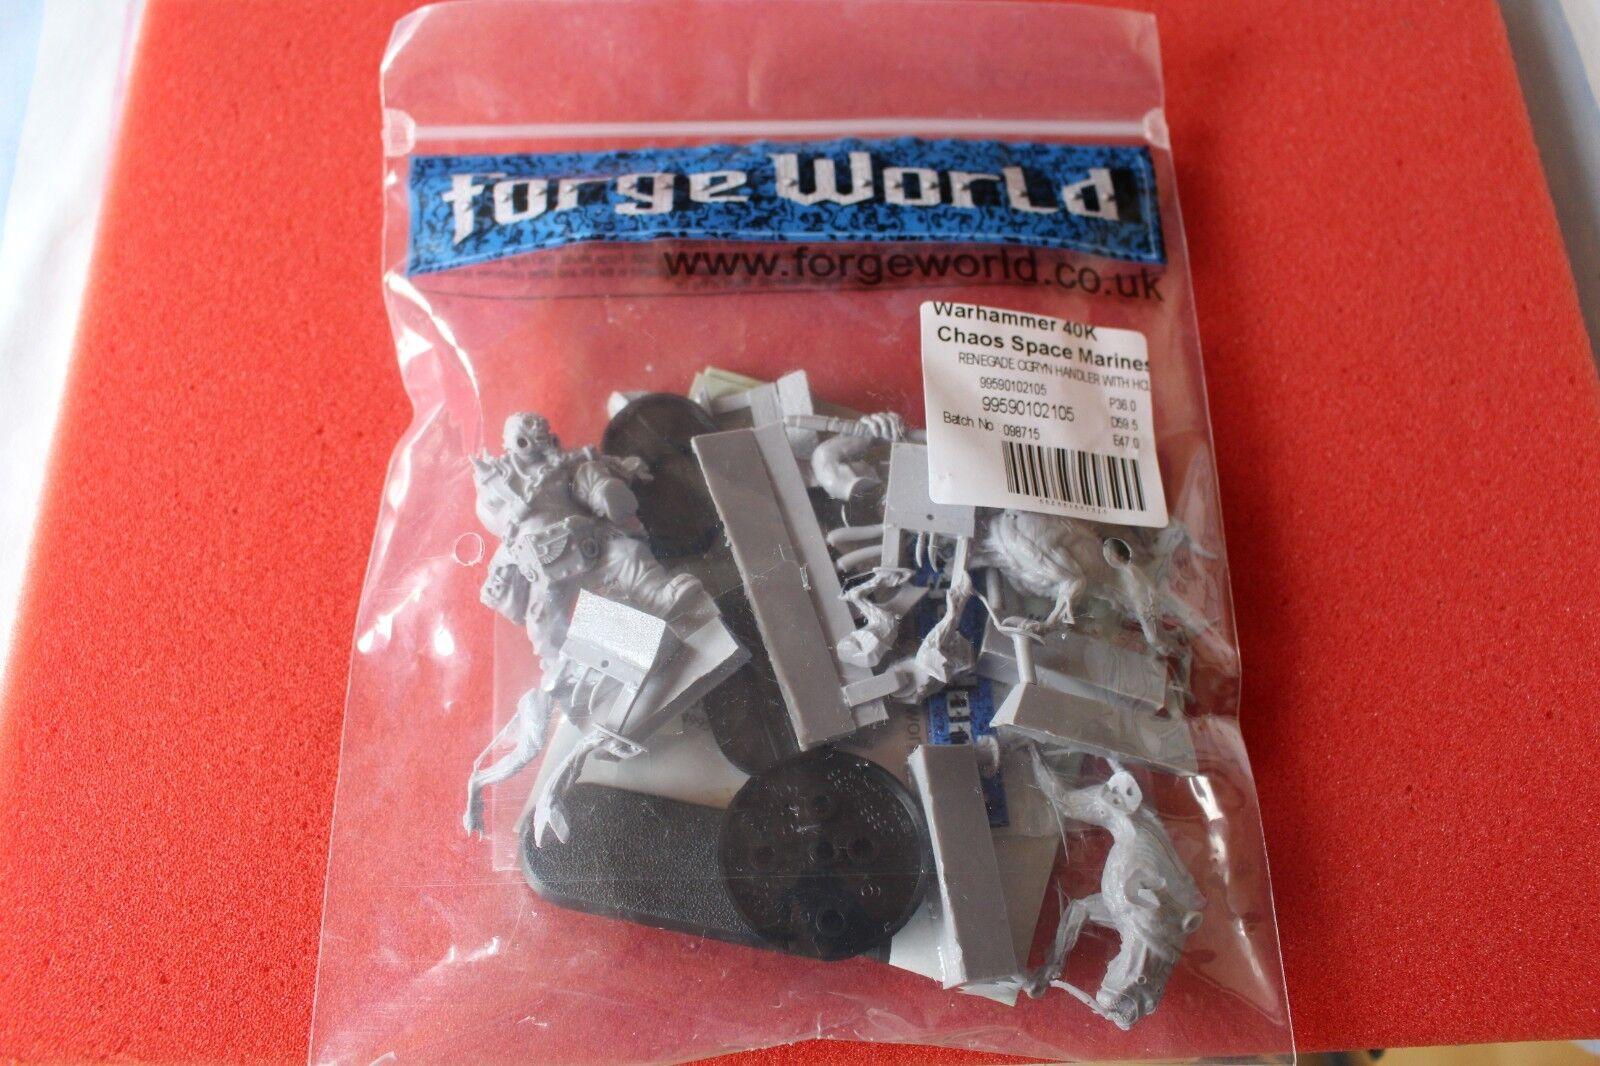 Forgeworld warhammer 40k  khornate Renegade Ogryn avec Hounds of Xaphan Neuf dans sa boîte nouveau  magasin de gros